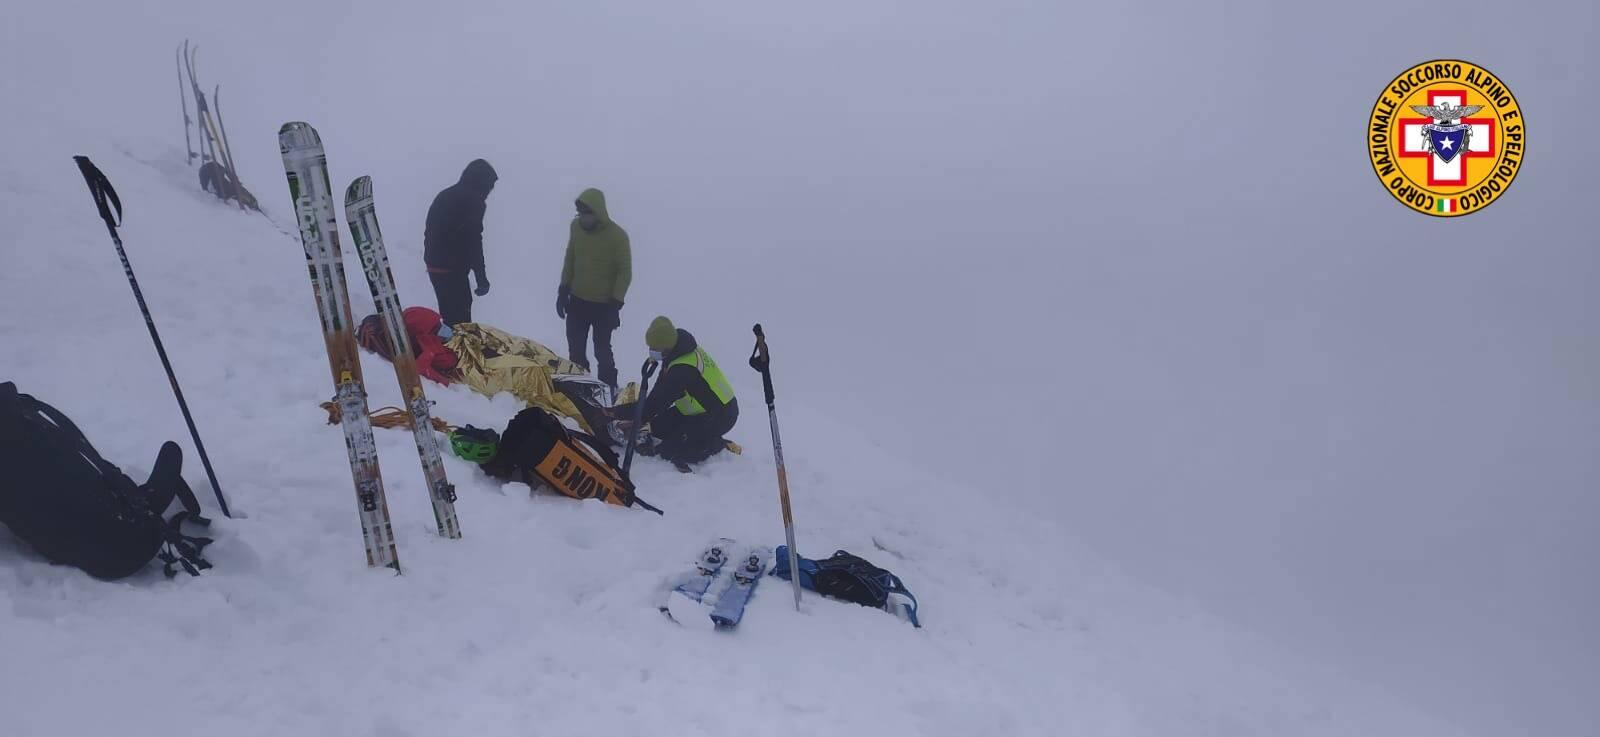 alpinisti caduti sul monte Grem